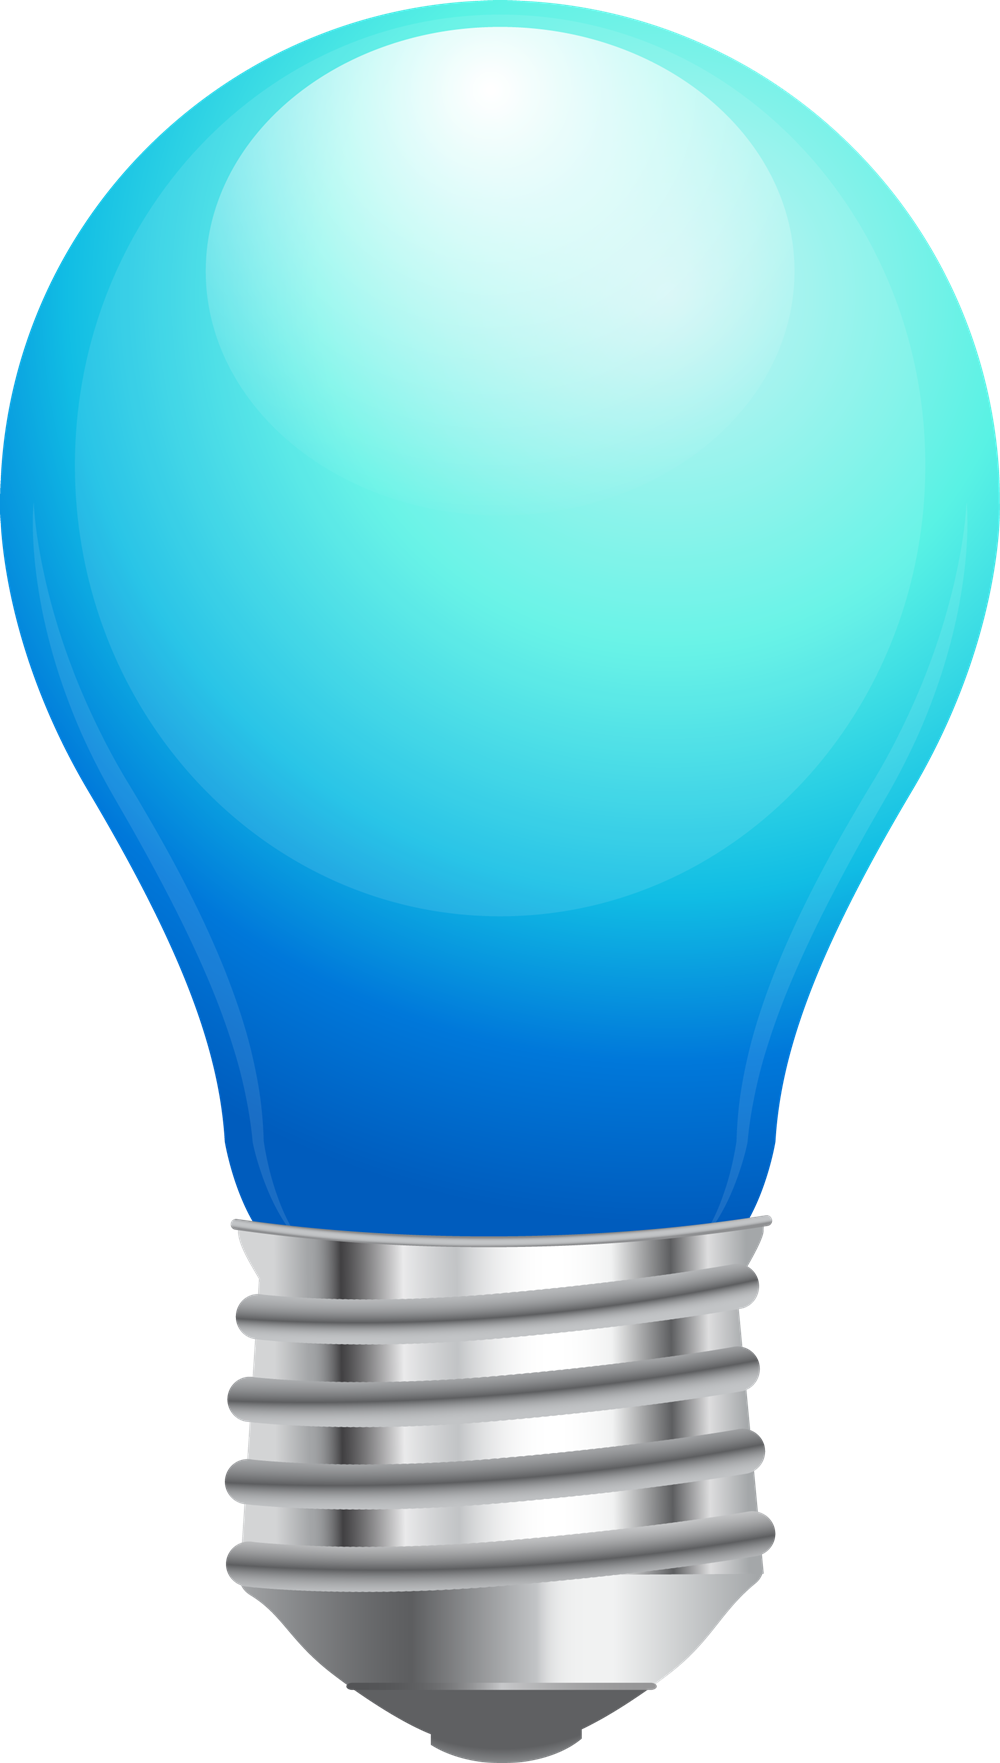 1000x1763 Free To Use Amp Public Domain Light Bulb Clip Art